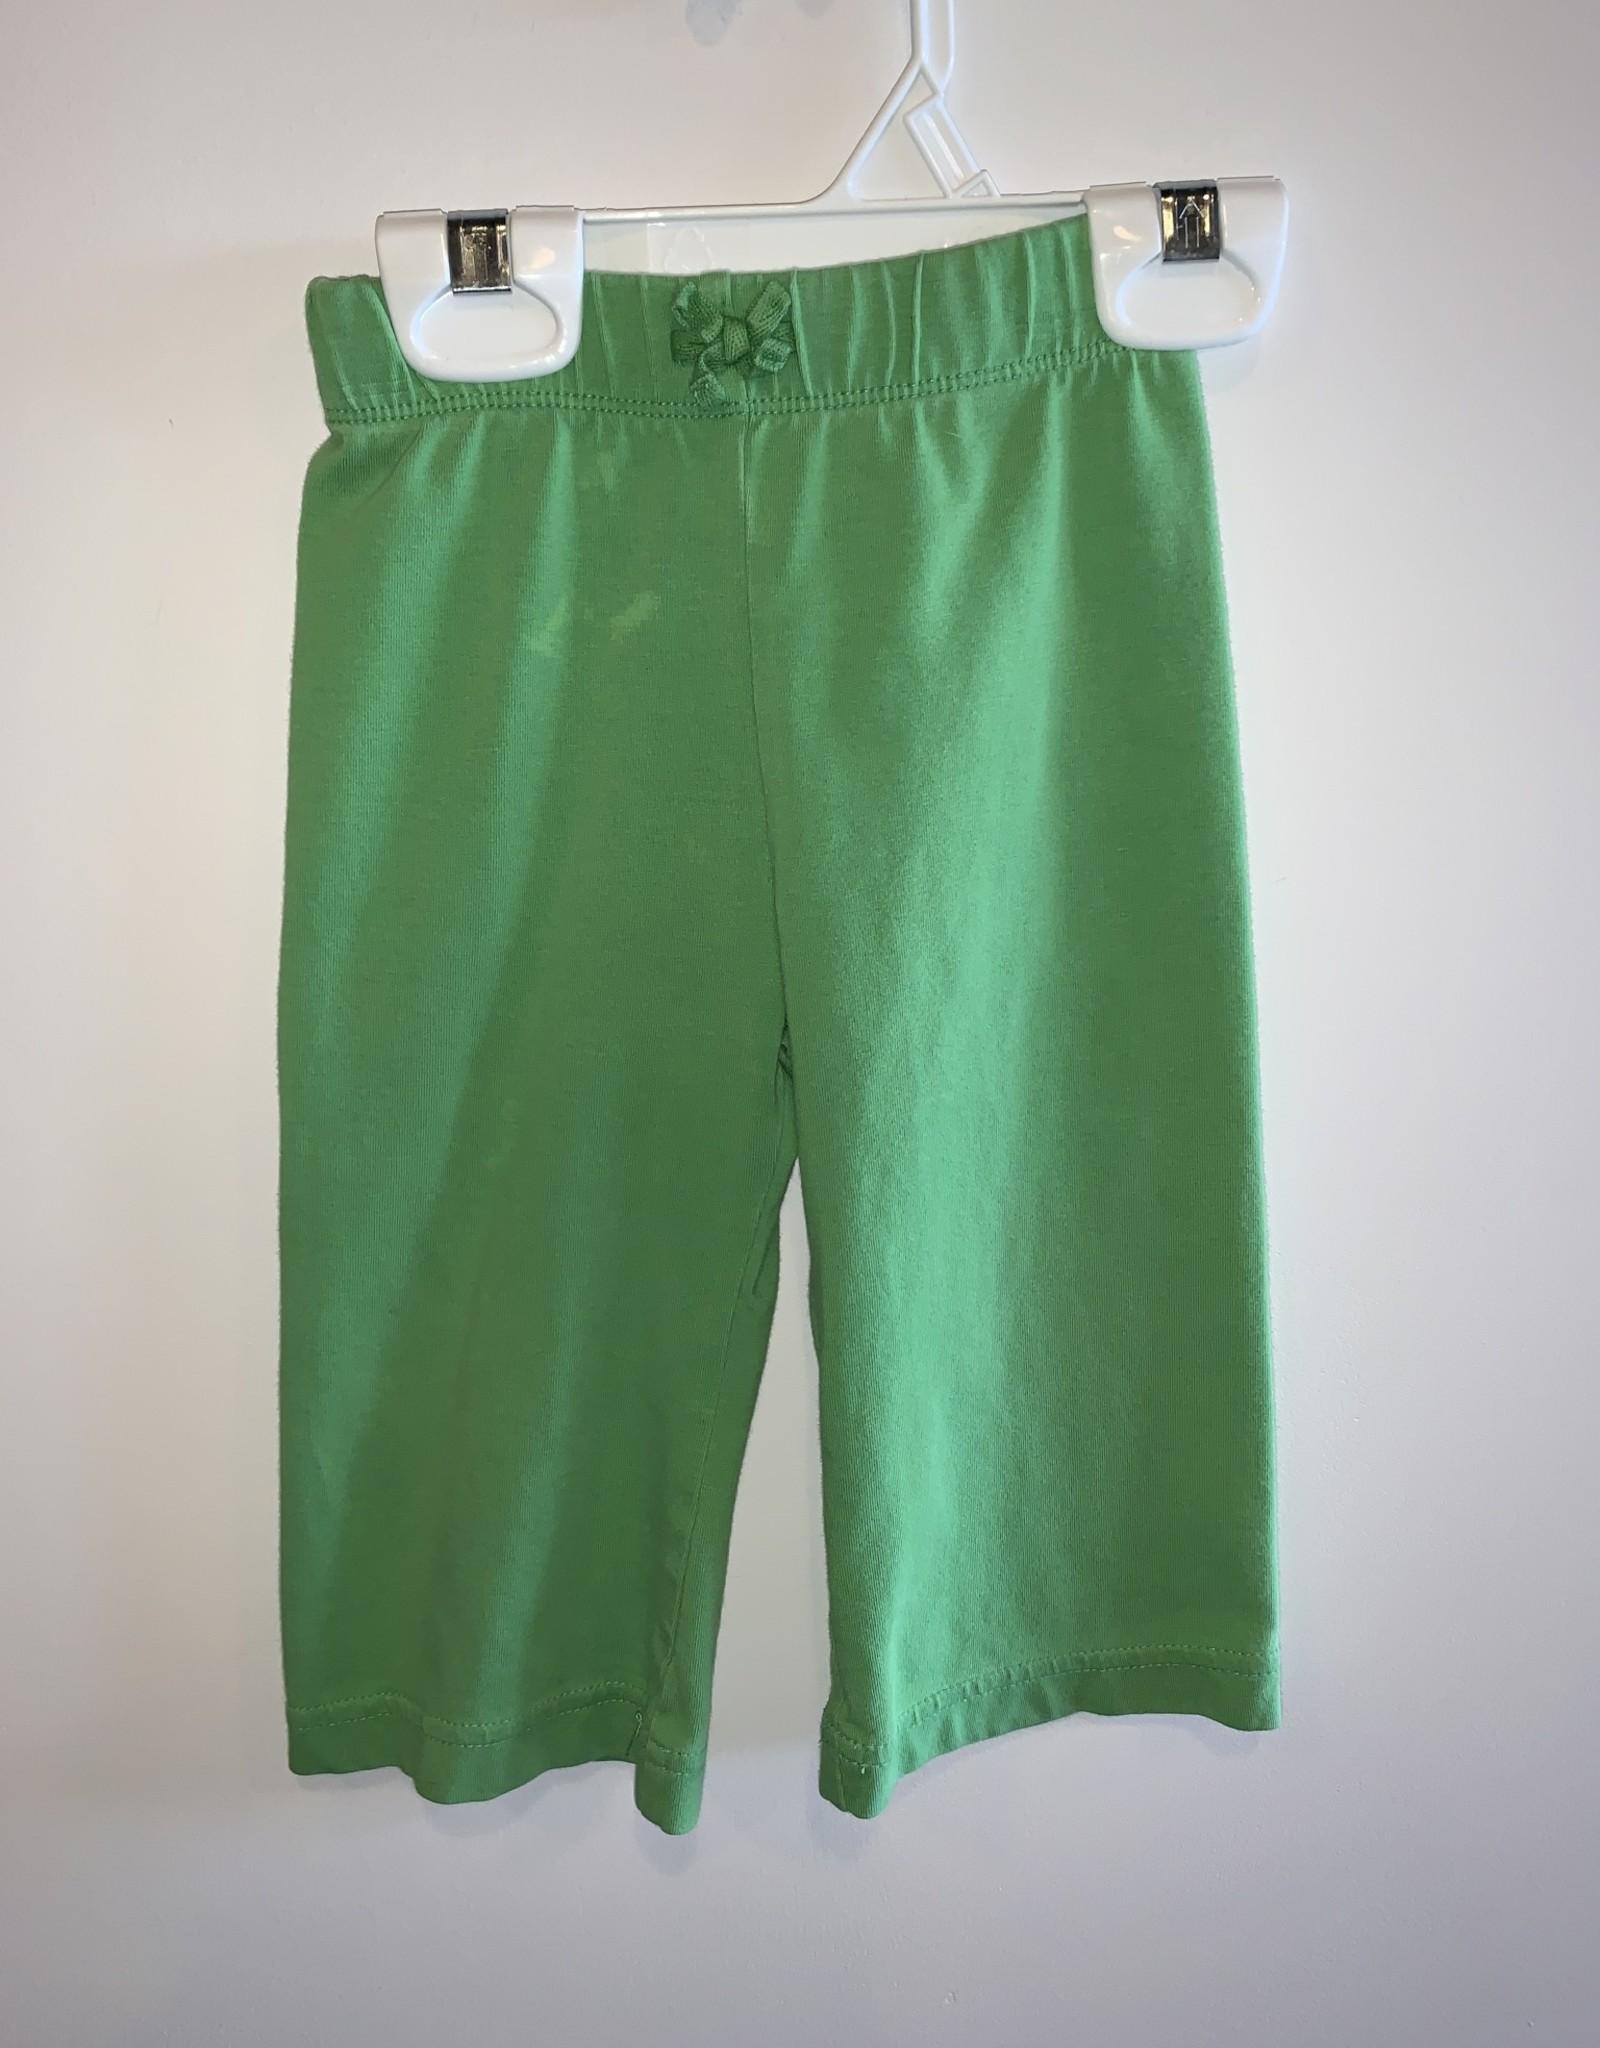 Gap Girls/12-18/Gap/Pants